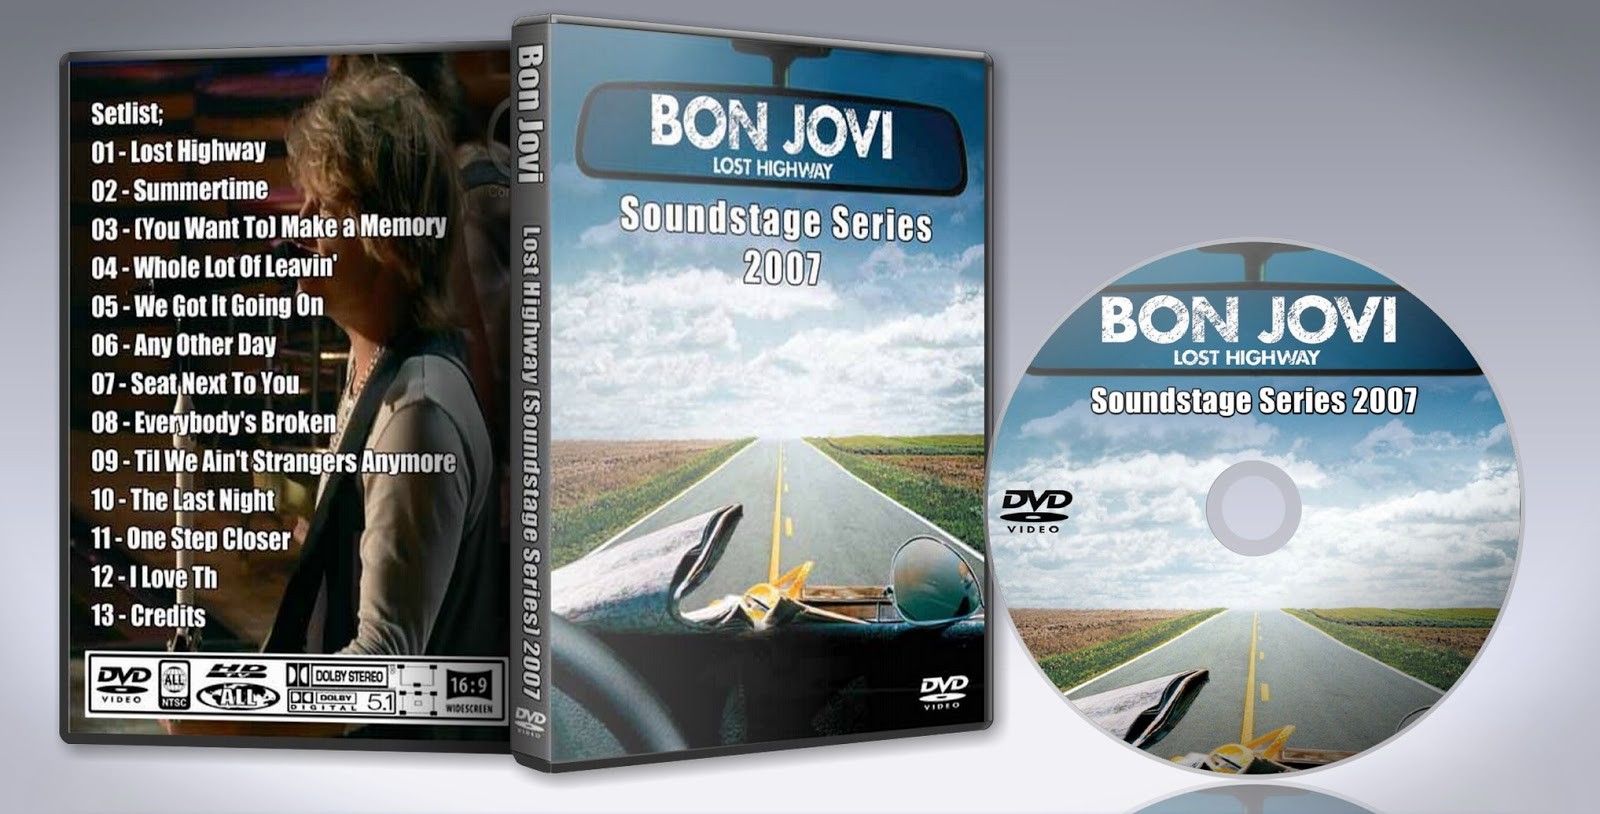 Lost Highway Bon Jovi